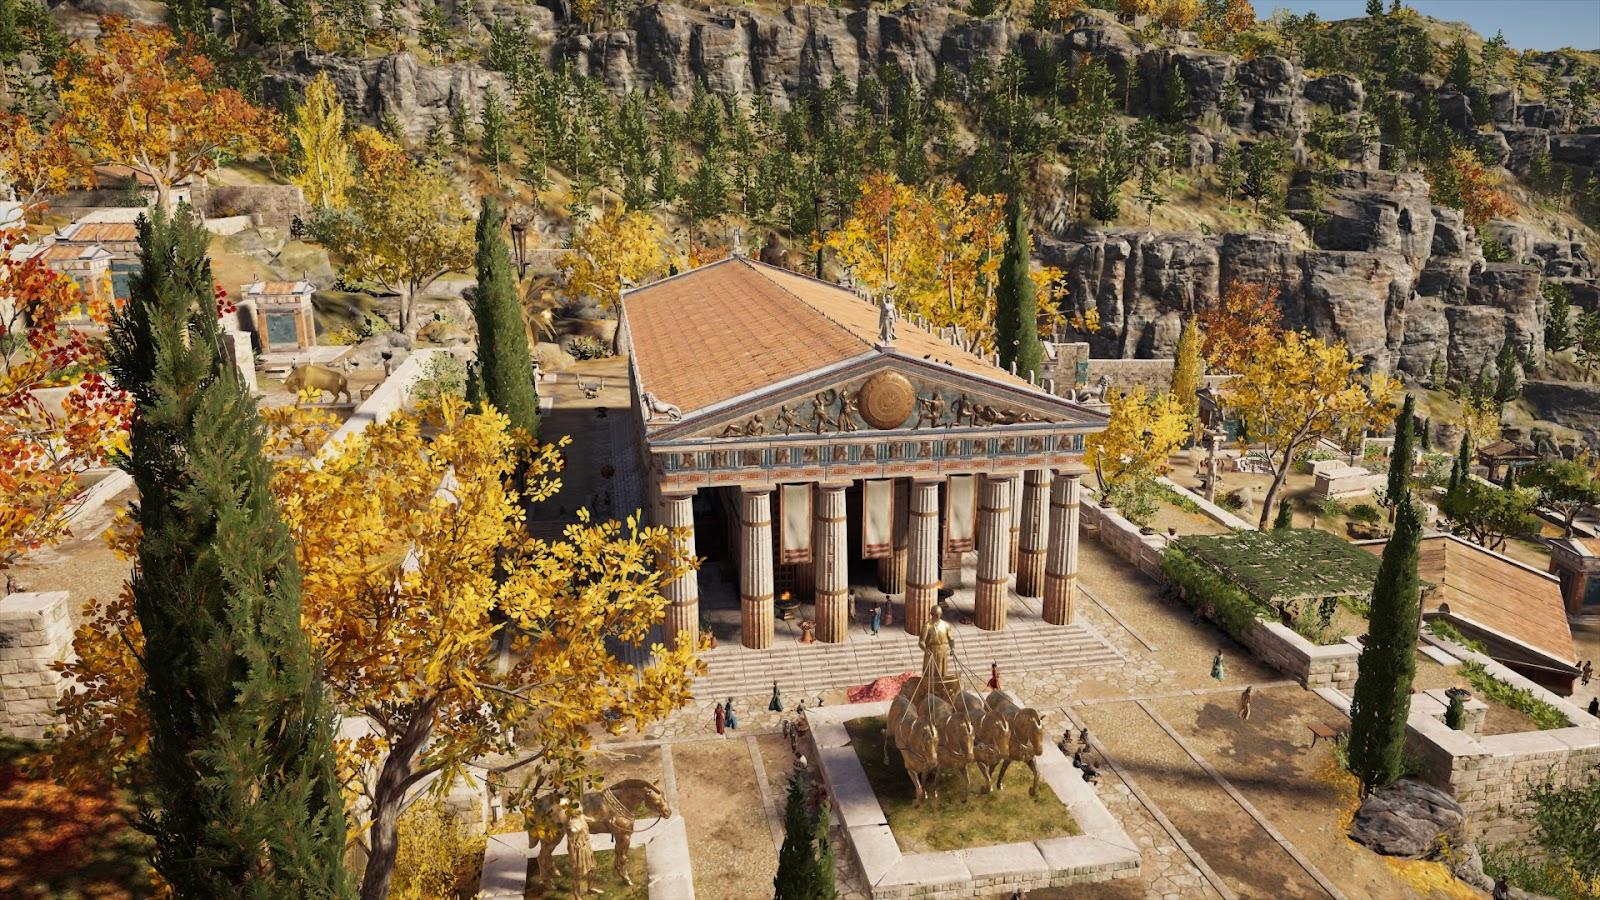 Delphi interpretation from the game Assassins Creed